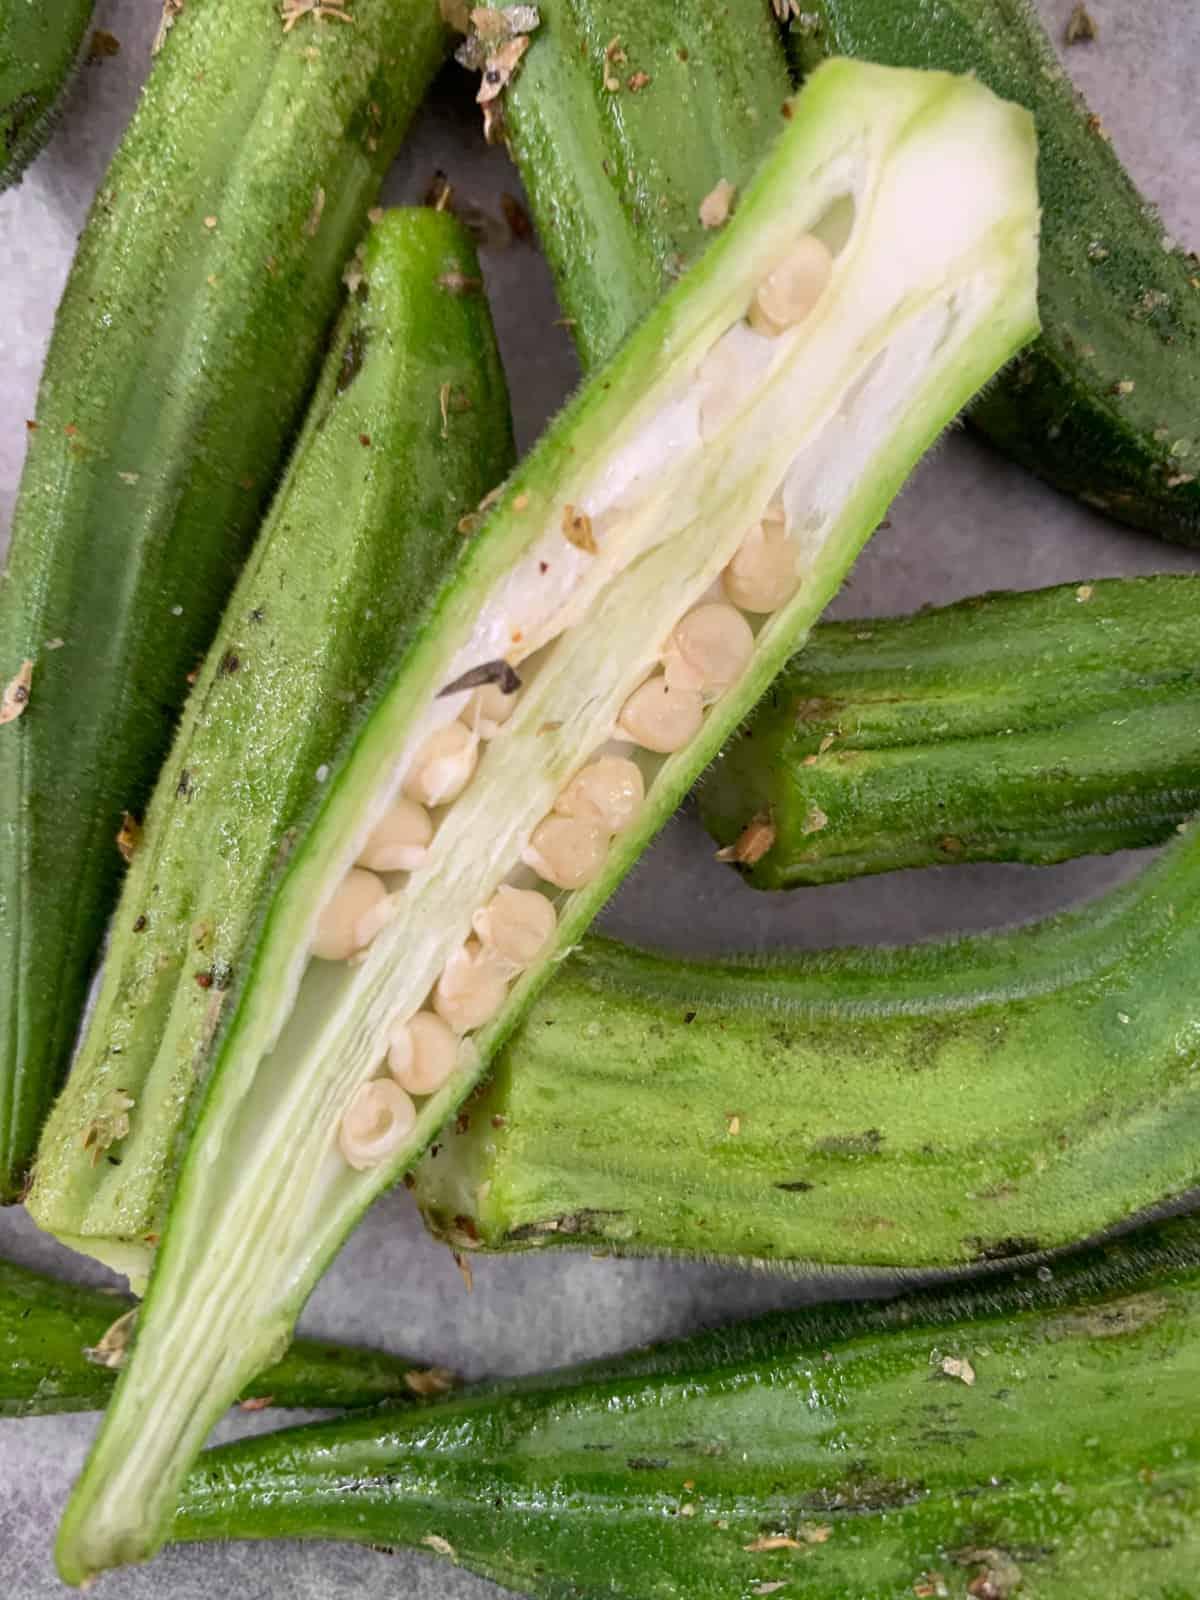 Fresh okra cut to show seeds